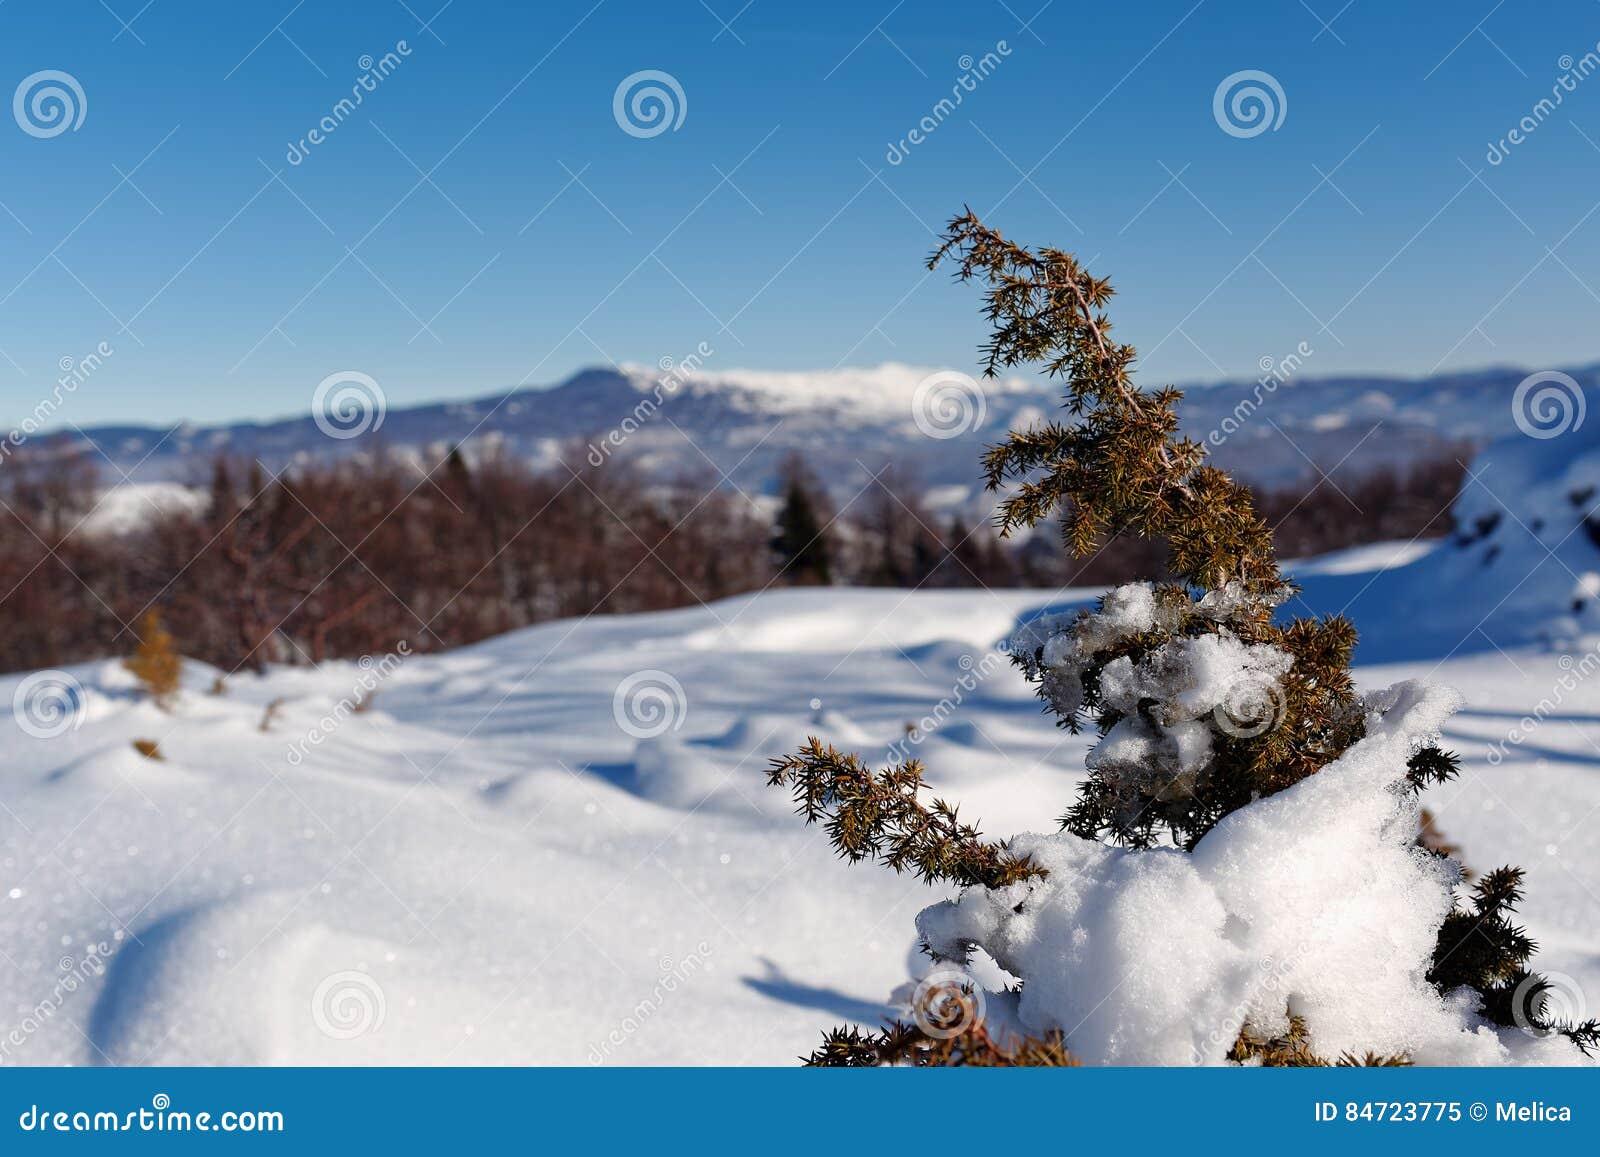 Snow Covered Juniper branch in winter.